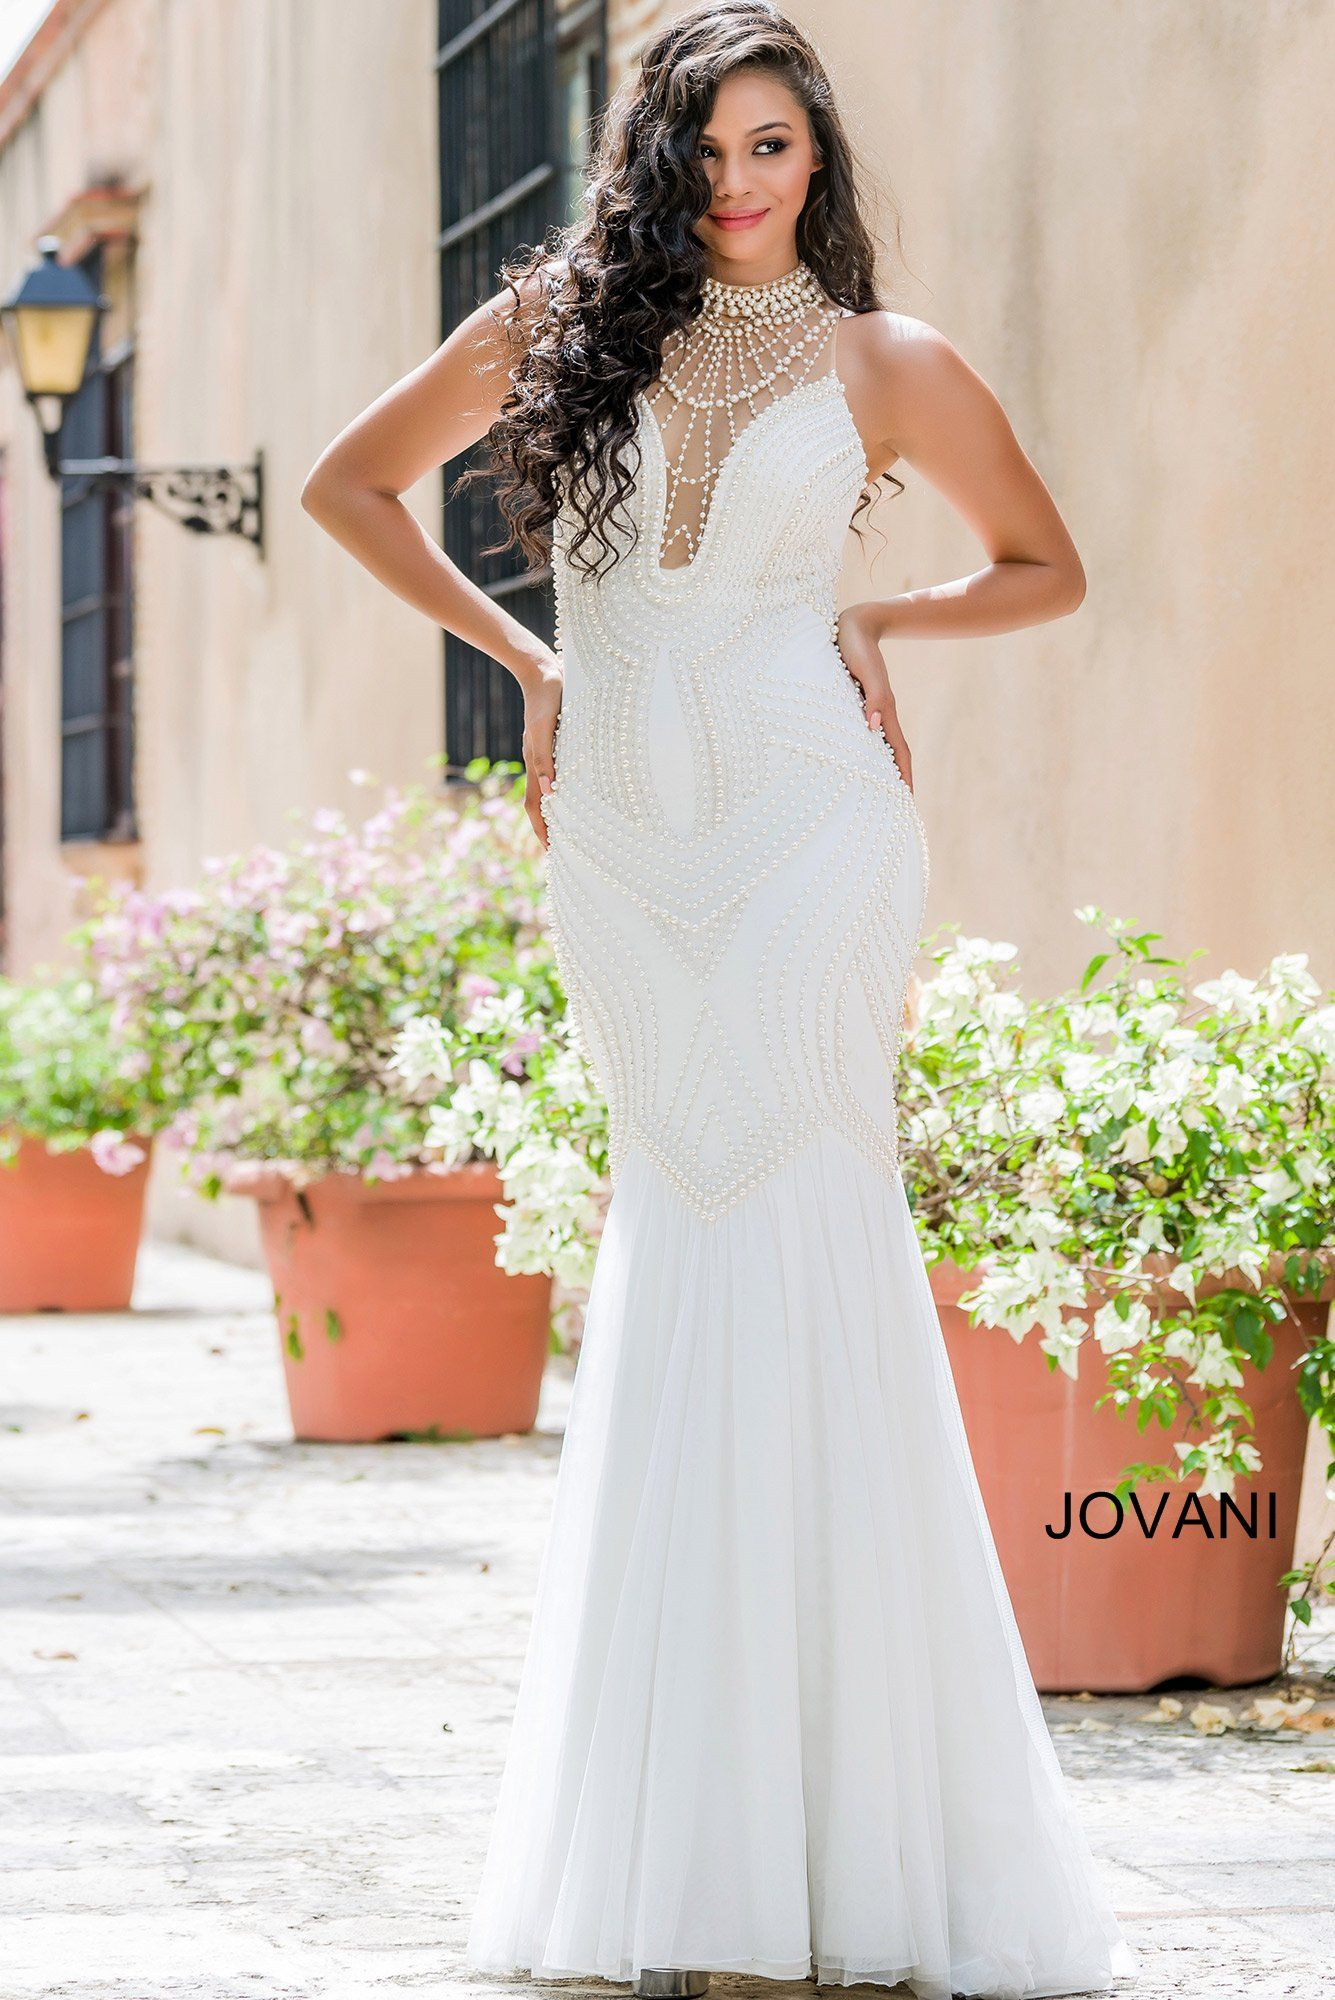 White Mermaid Prom Dress 24663 | Cool stuff to buy | Pinterest ...